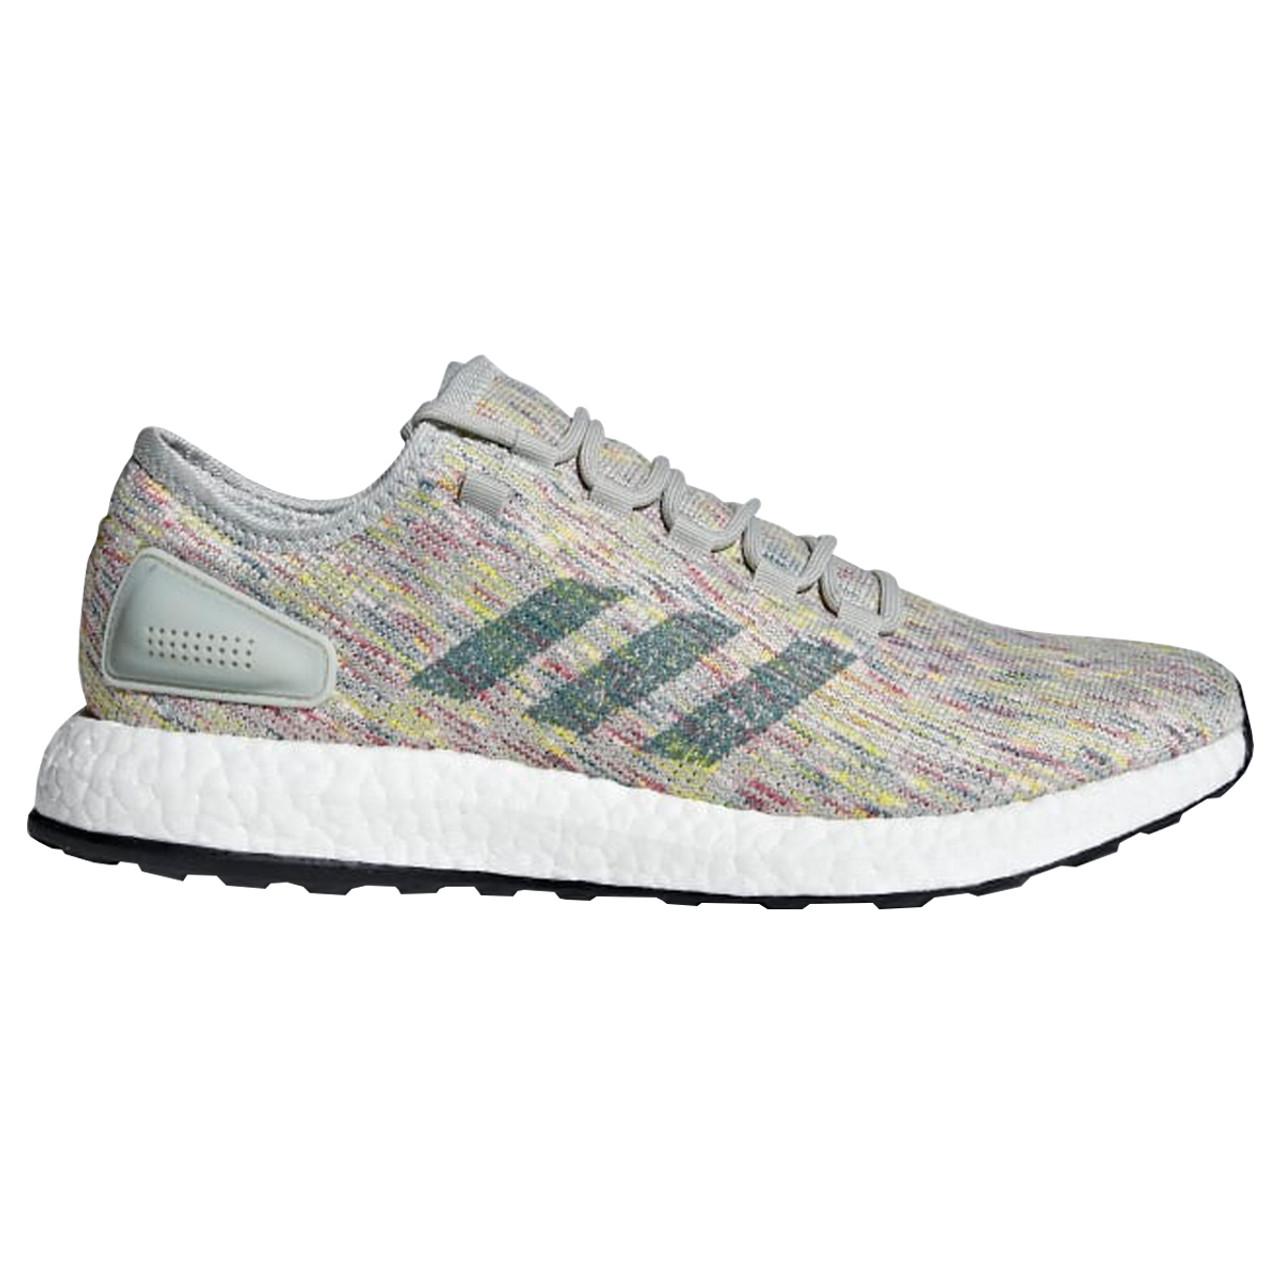 buy popular 86fc8 637d9 Adidas PureBOOST Men s Running Sneakers AQ0051 - Silver, Green, Yellow ...